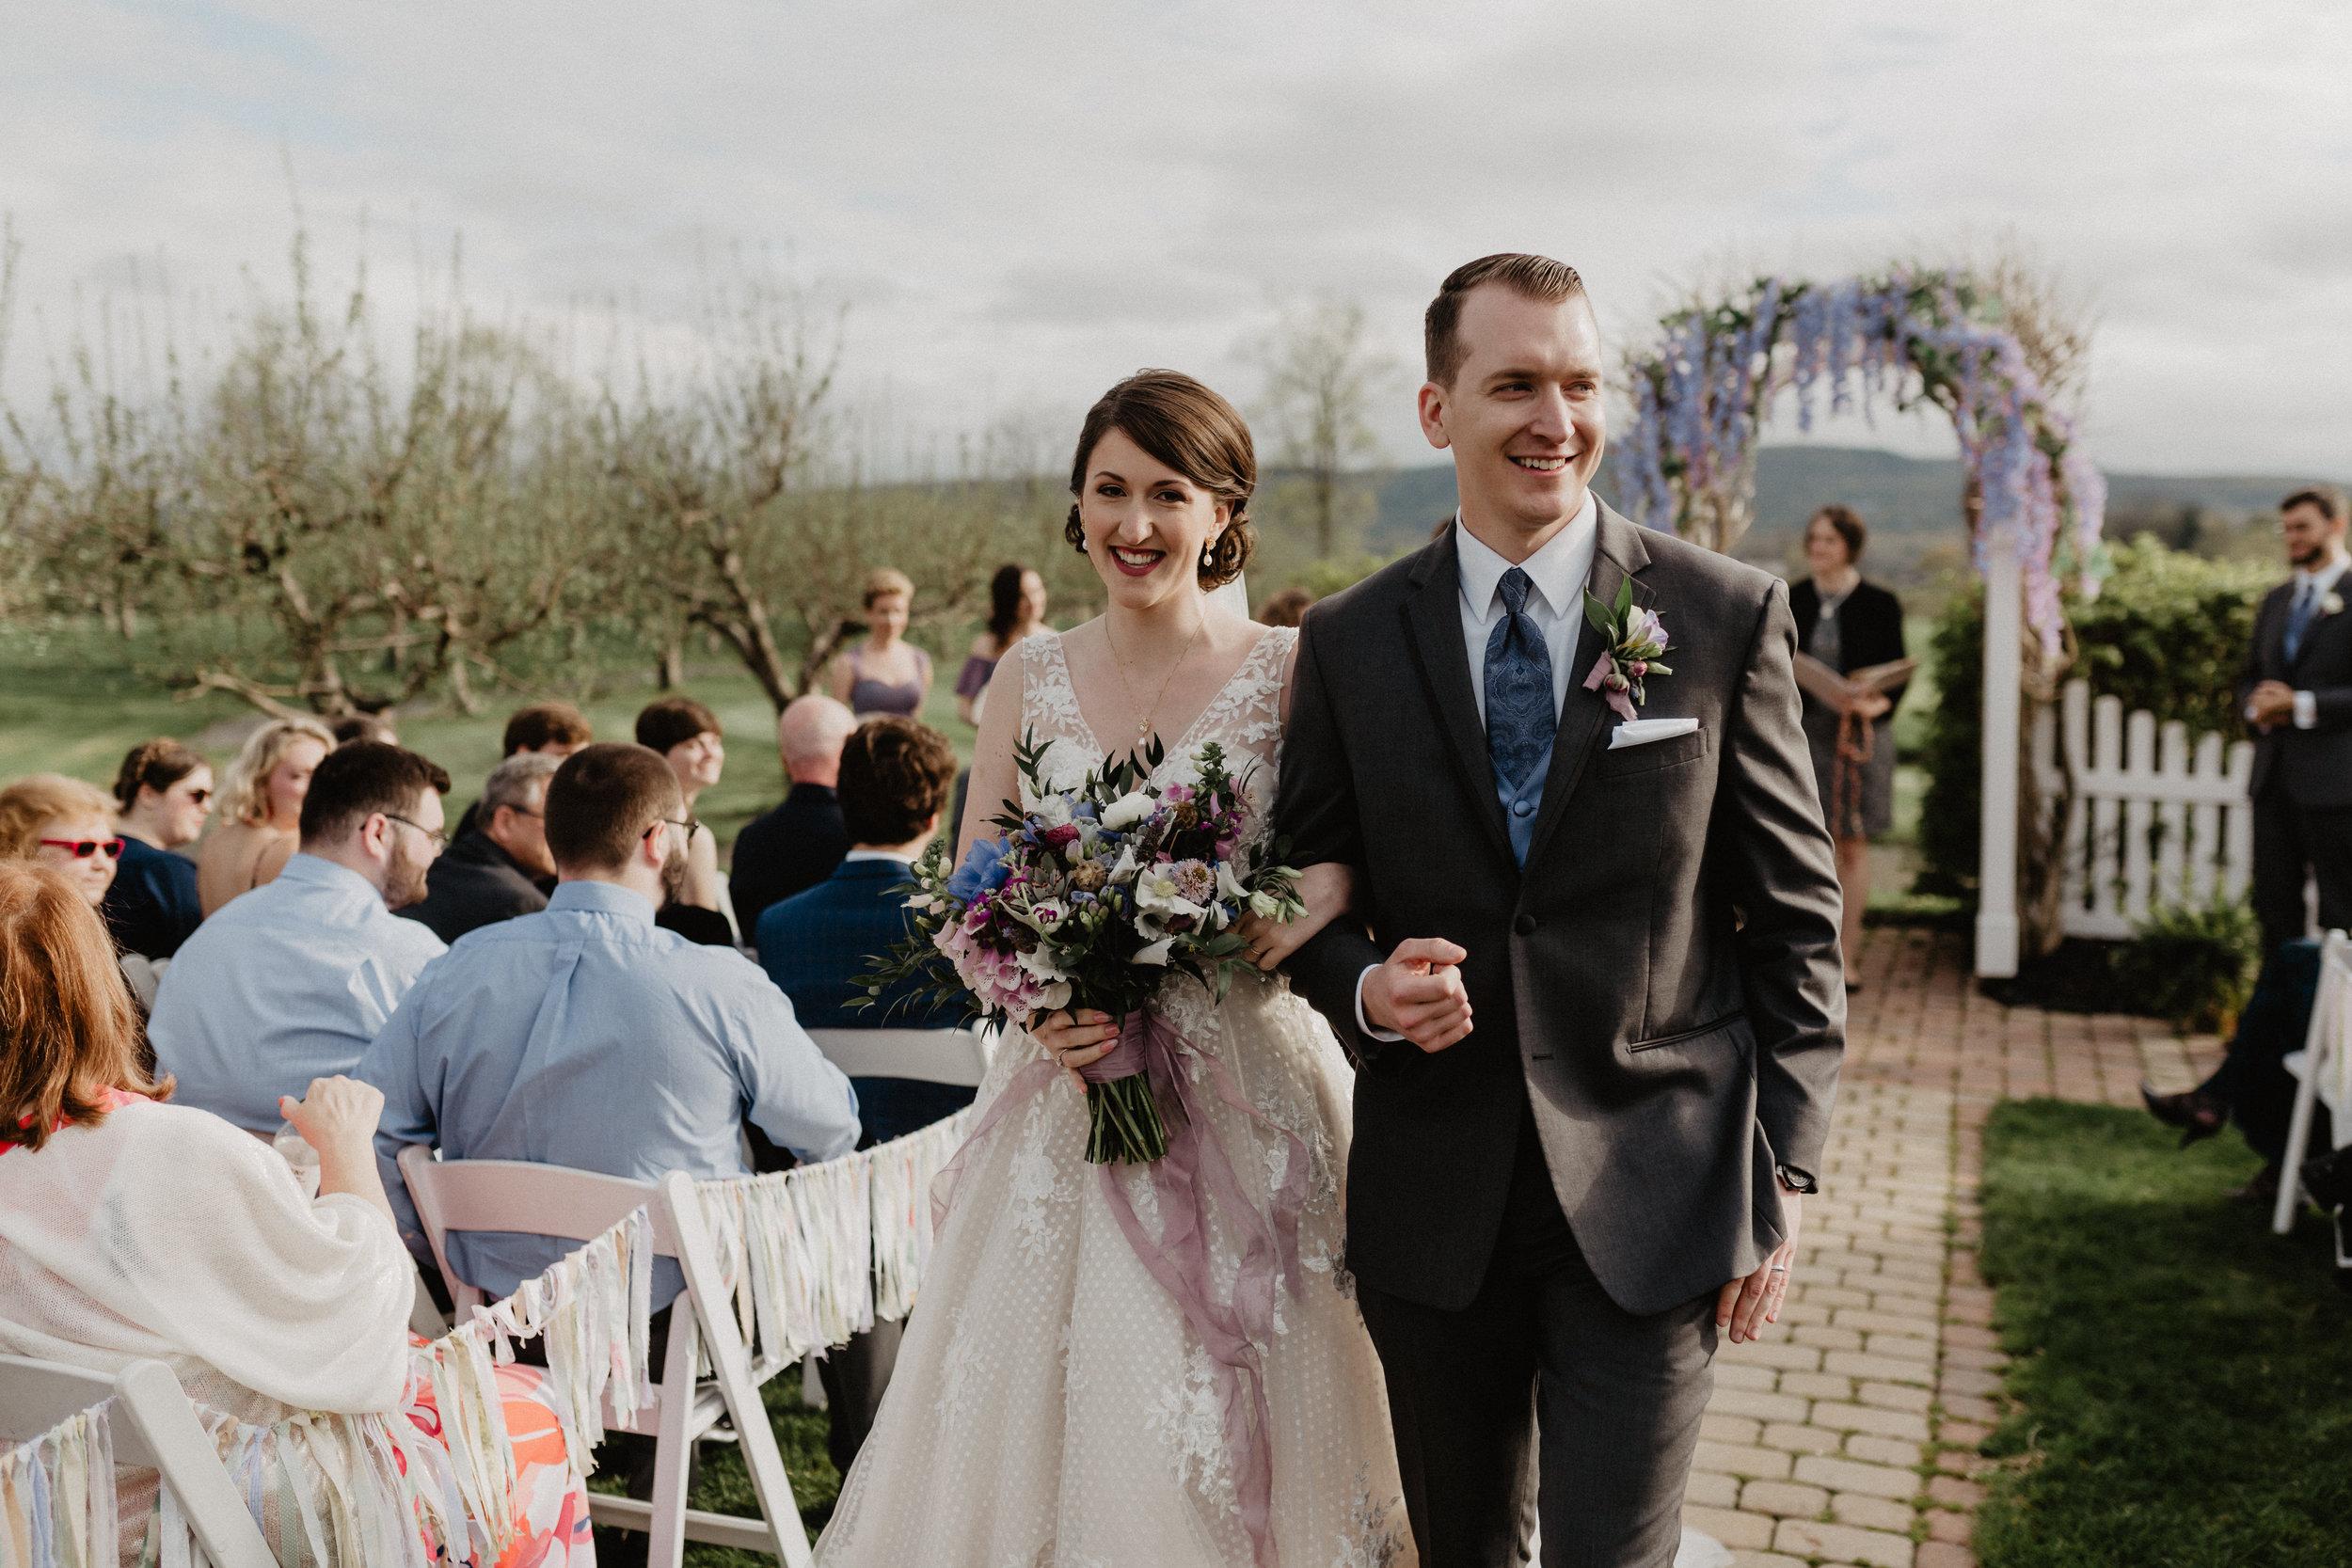 orchard-creek-wedding_047.jpg